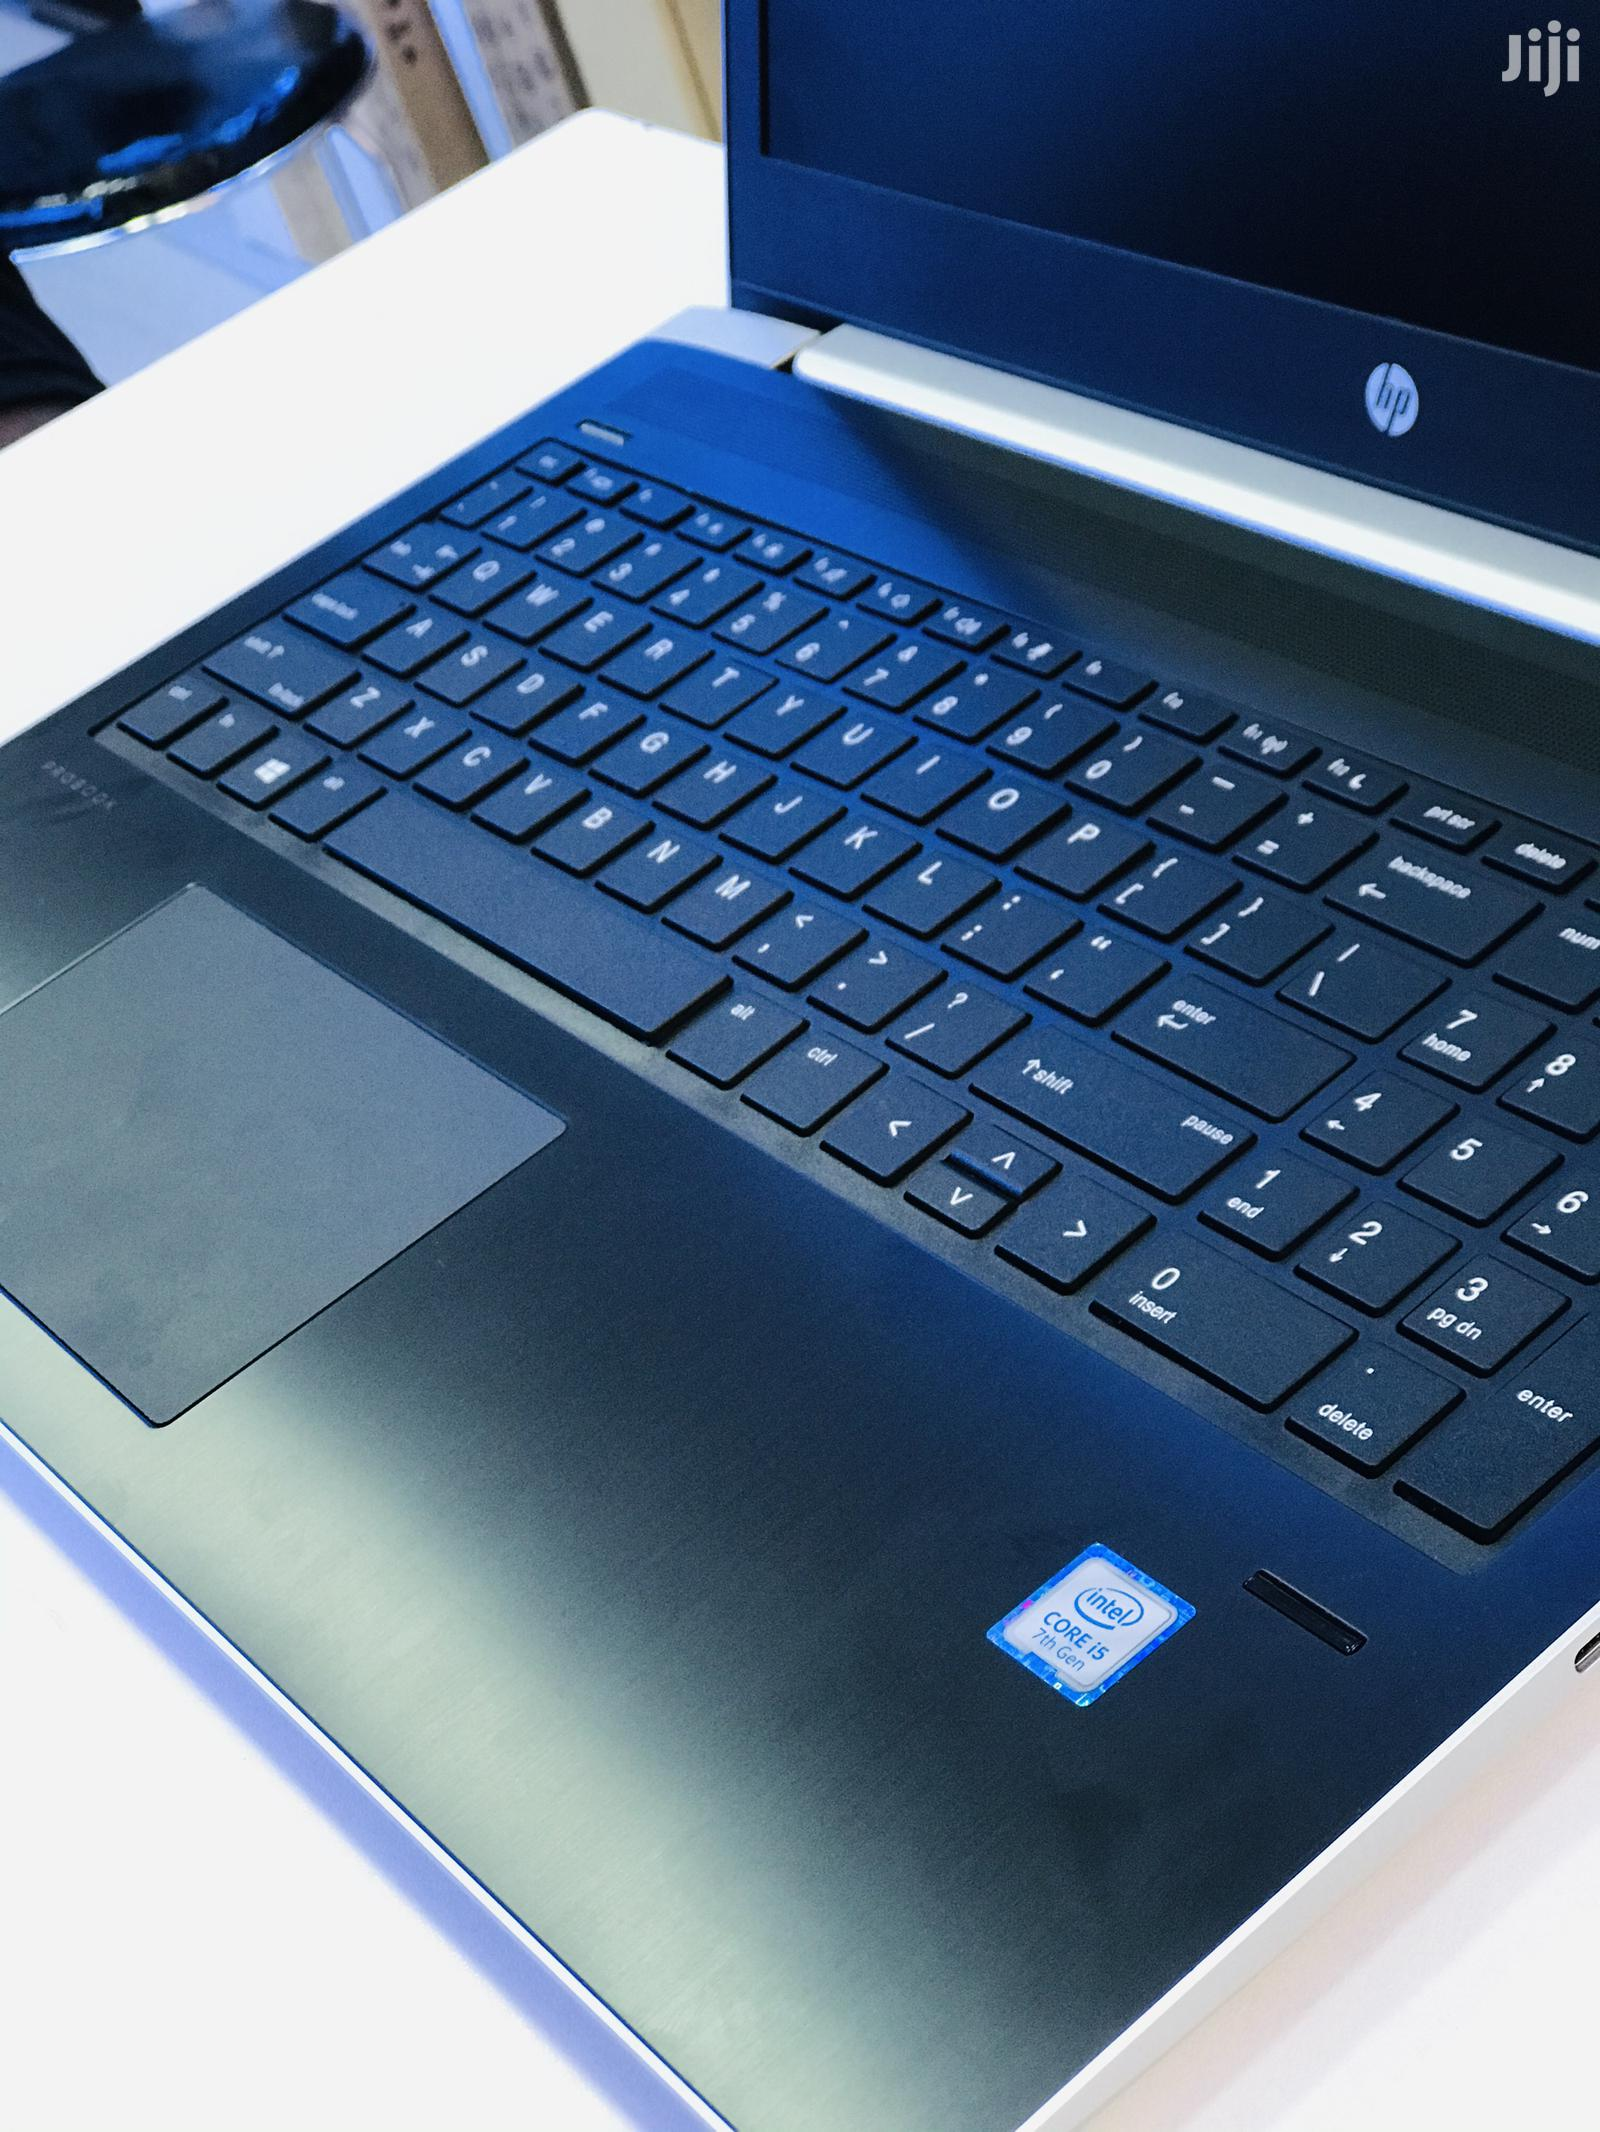 New Laptop HP ProBook 450 G5 8GB Intel Core I5 SSHD (Hybrid) 1T | Laptops & Computers for sale in Kampala, Central Region, Uganda